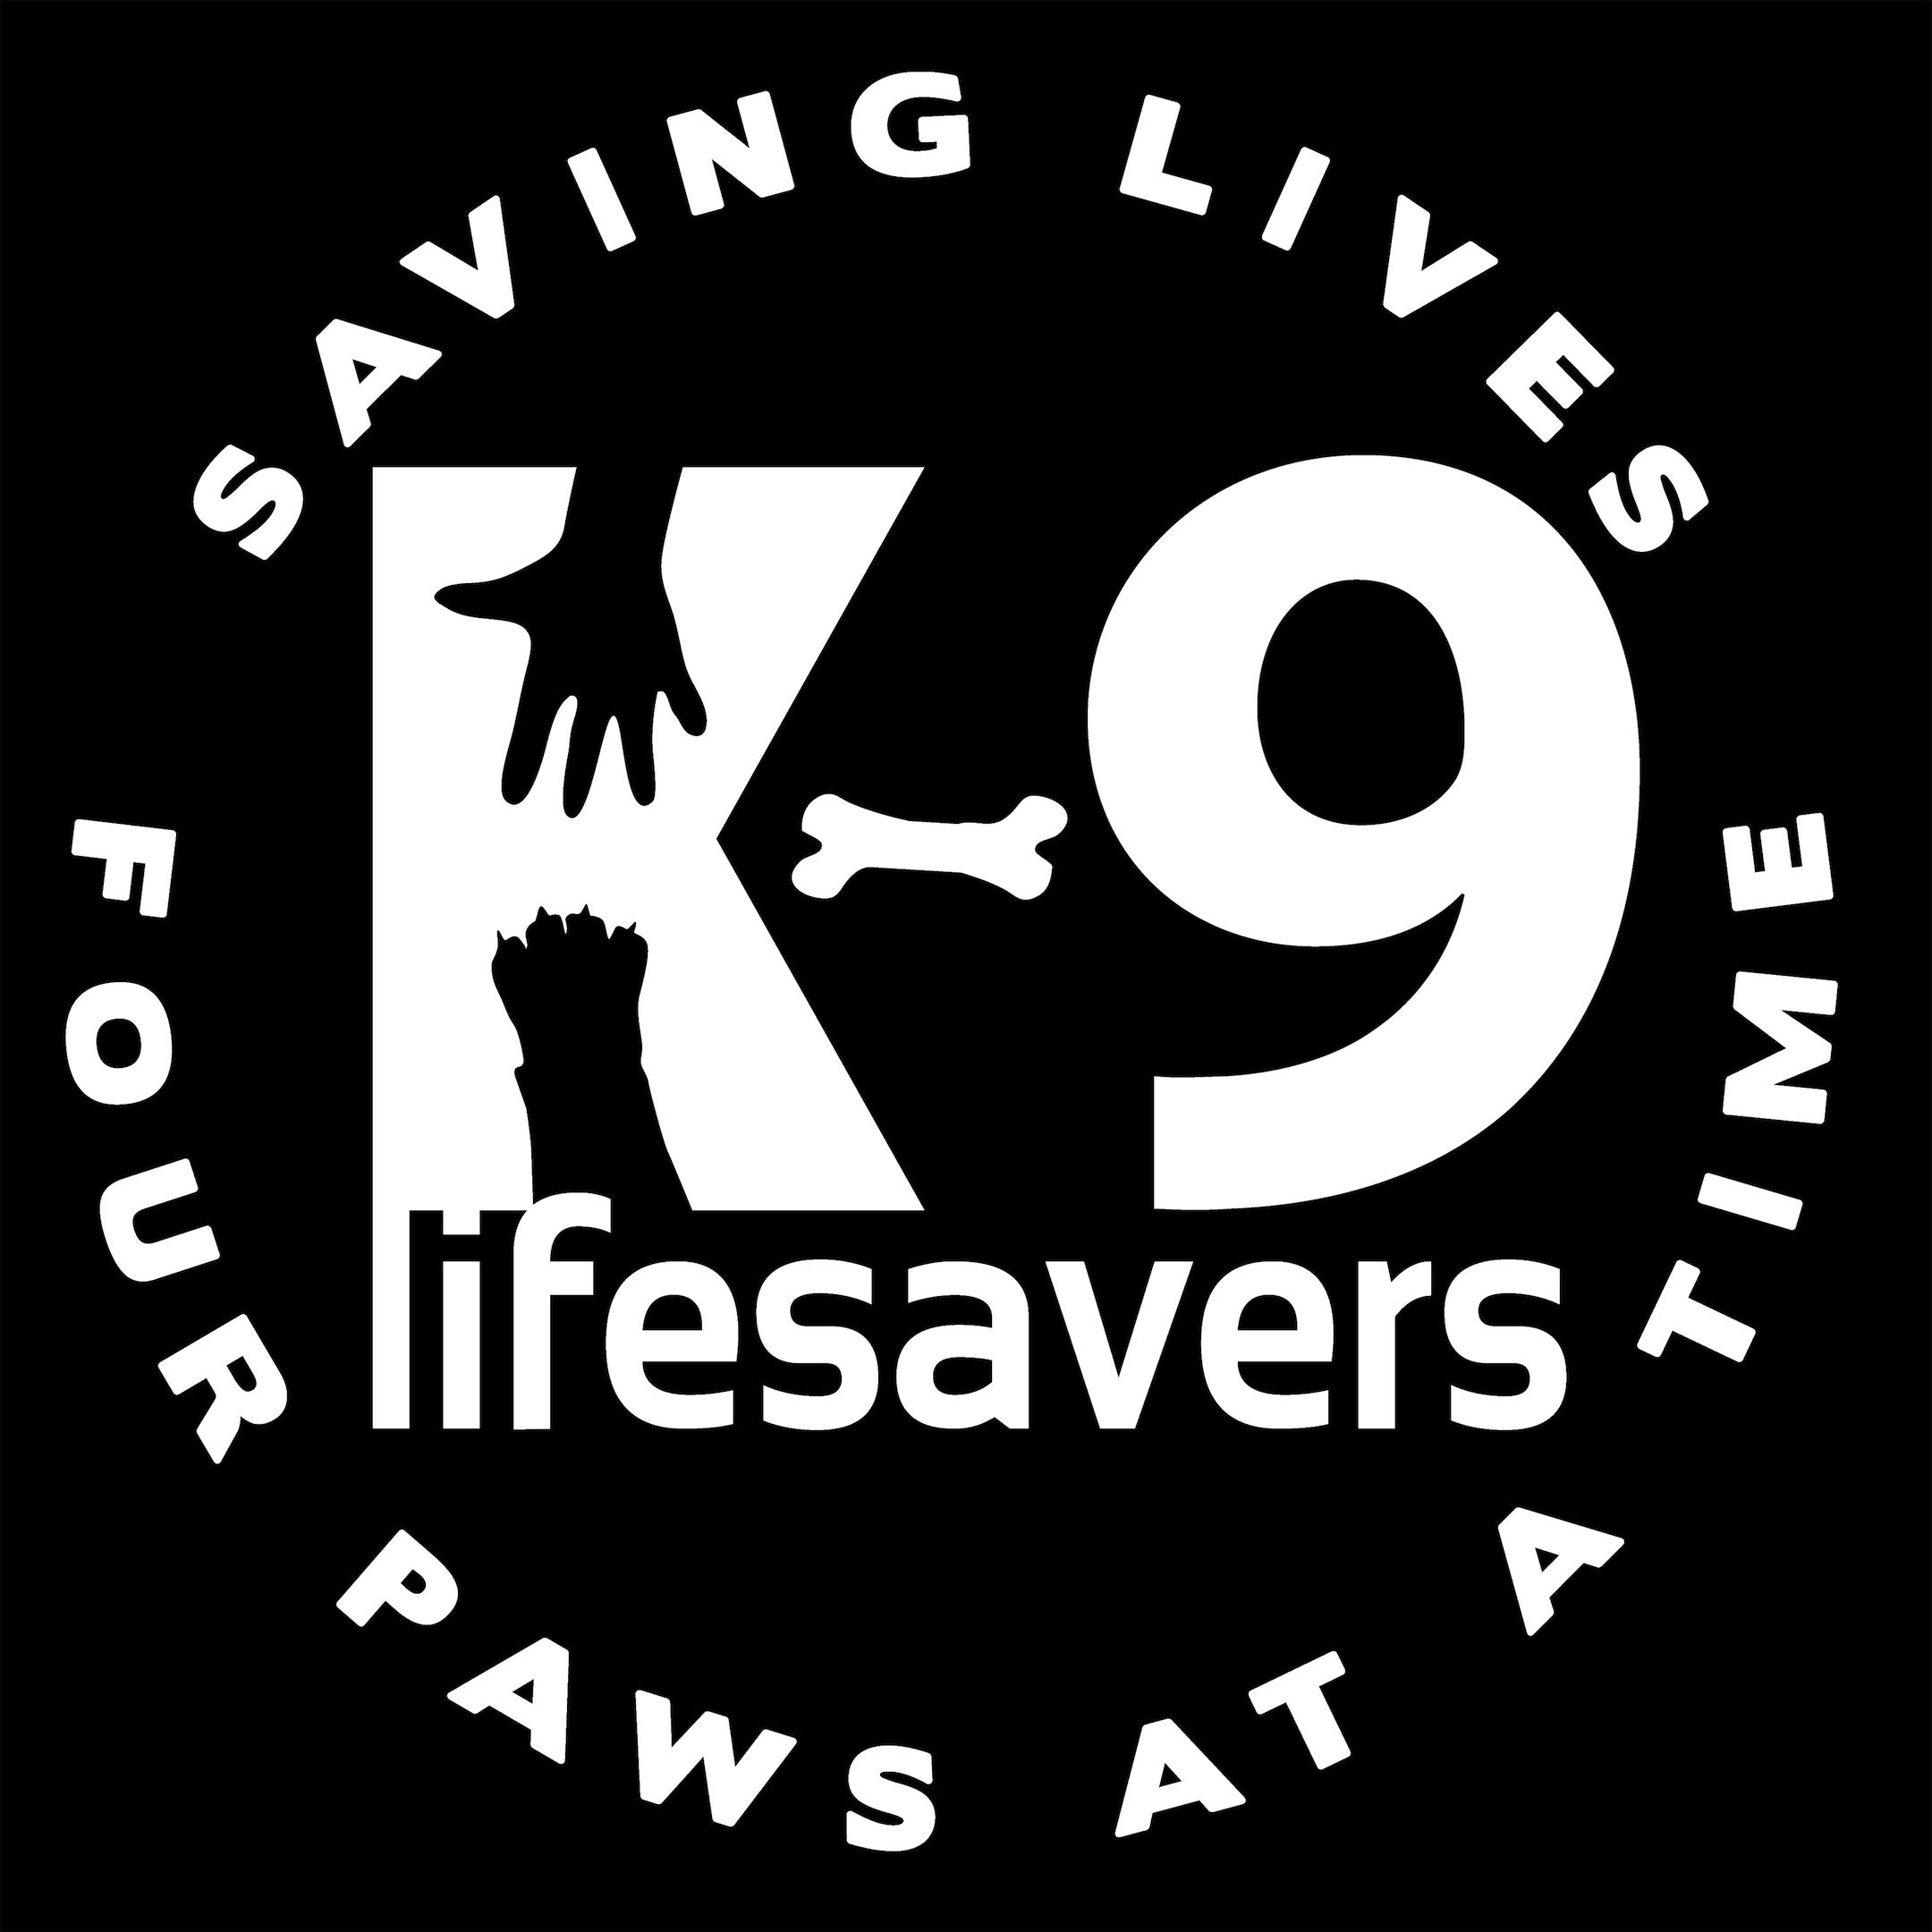 K-9 Lifesavers